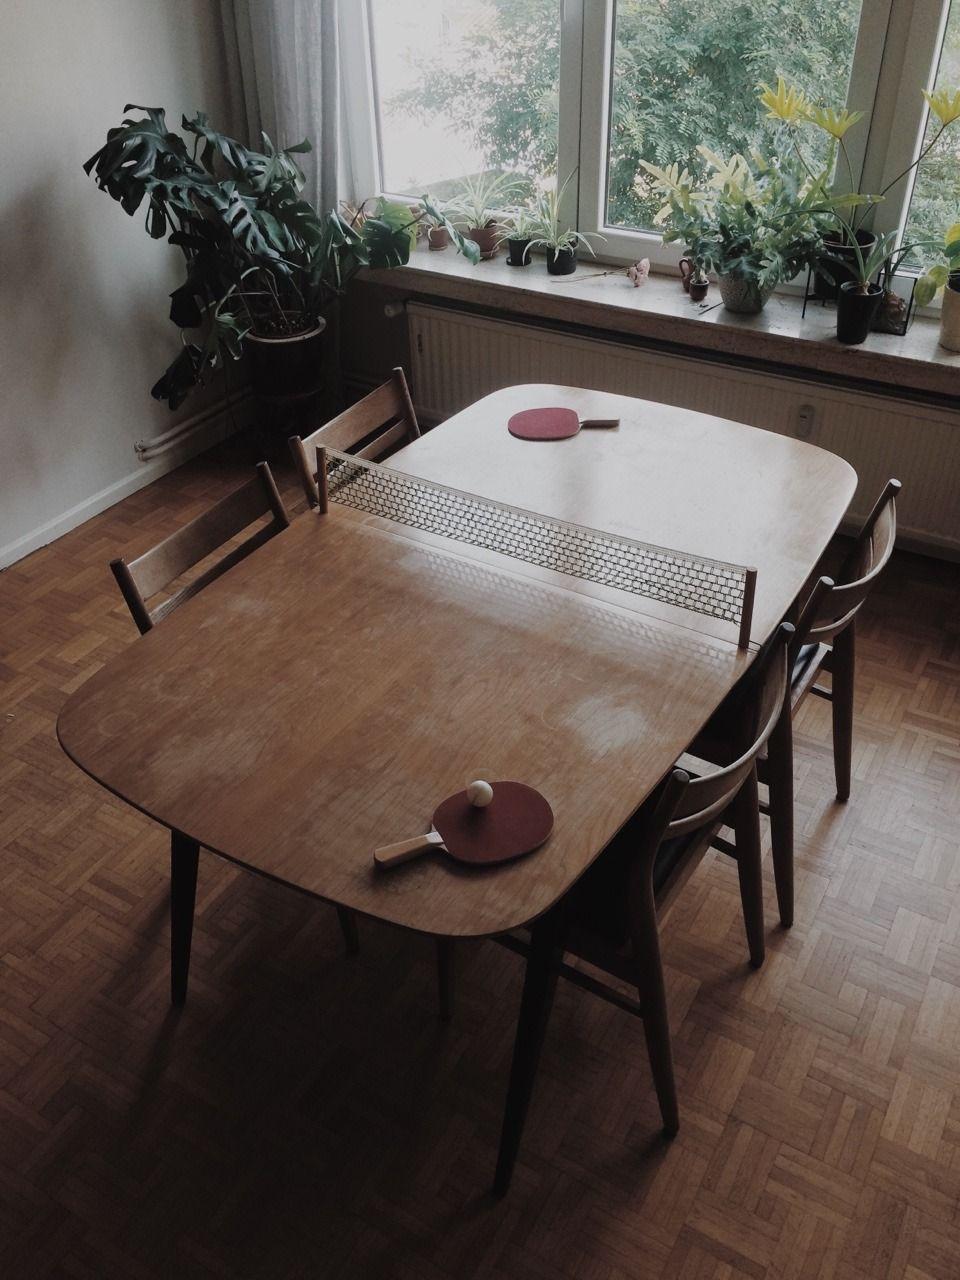 Table Tennis Room Design: Eenufframeteenpitslichteke: Table